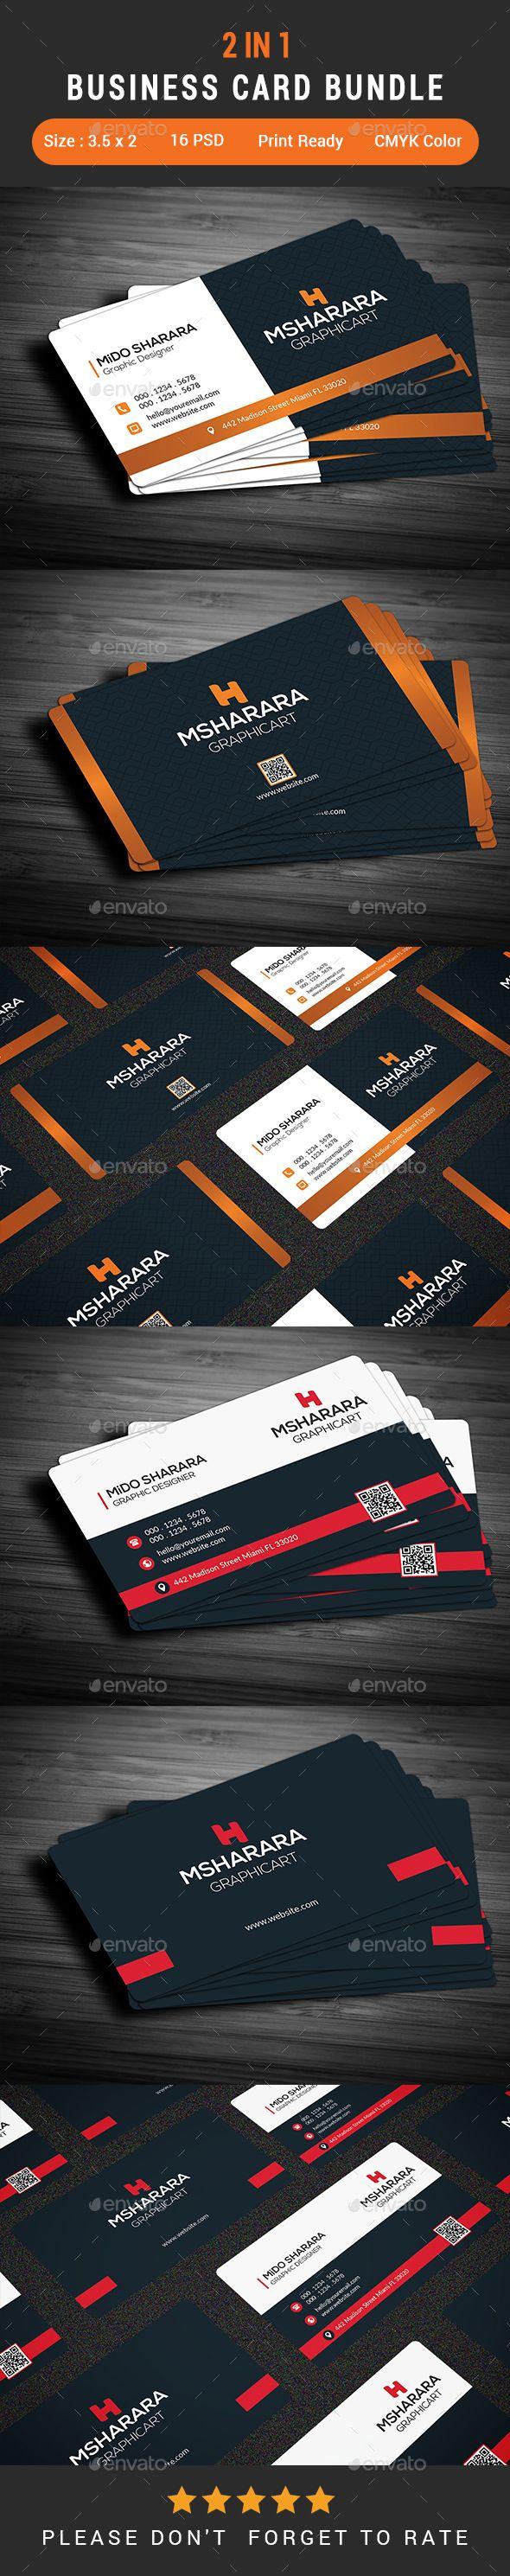 3384 Best Business Card Images On Pinterest Business Cards Visit